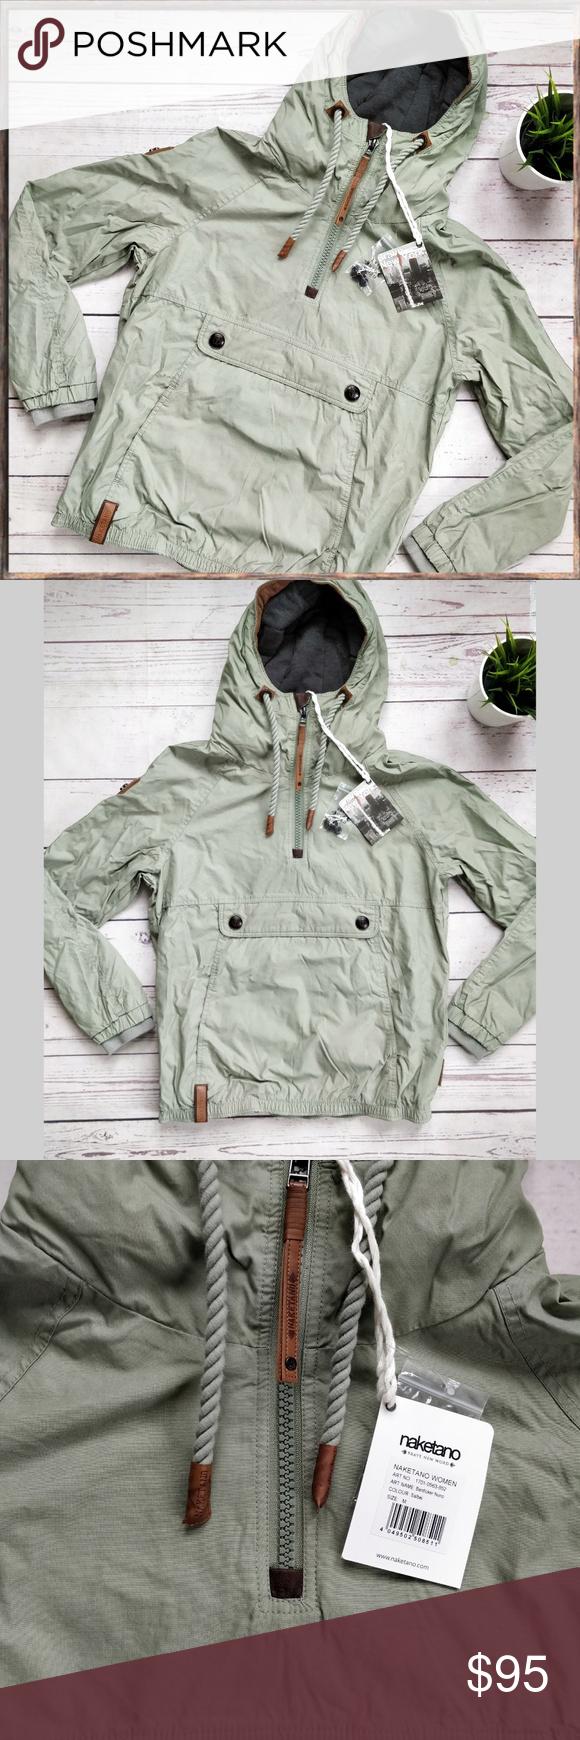 NWT NAKETANO Half Zip Hooded Light Green Jacket M This is a